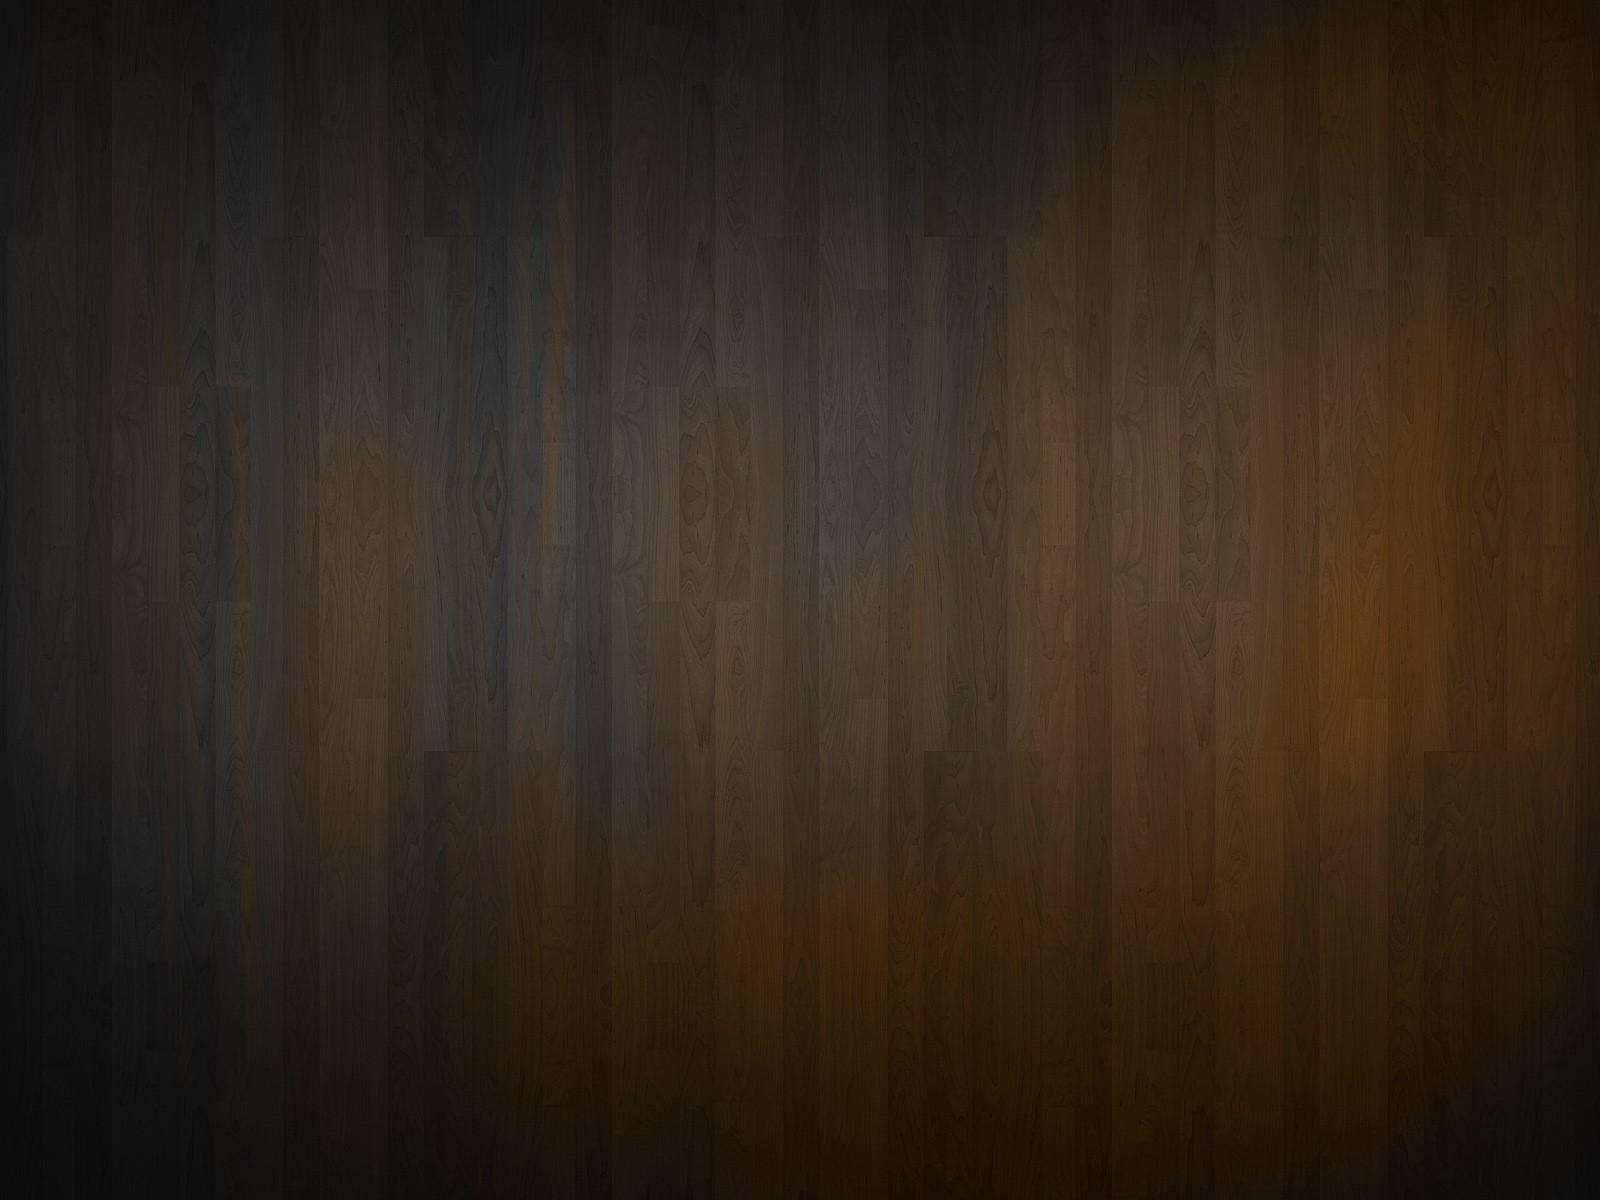 holz stock hartholz 1600x1200 px bodenbelag holzboden holzbeize laminatboden general - Hartholz Oder Laminatboden